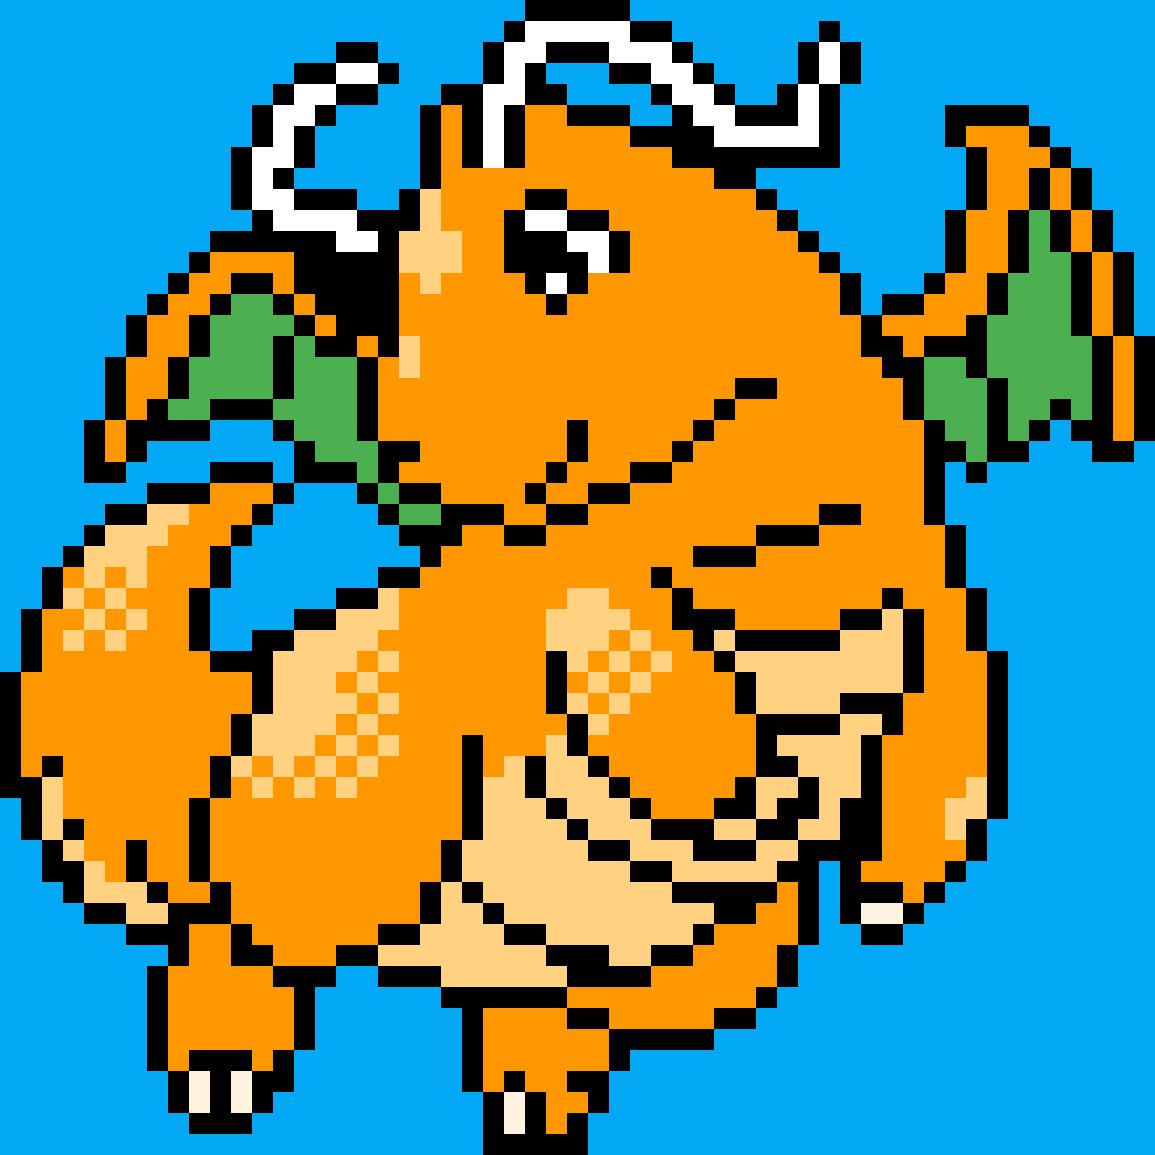 dragonite by nerd4Real